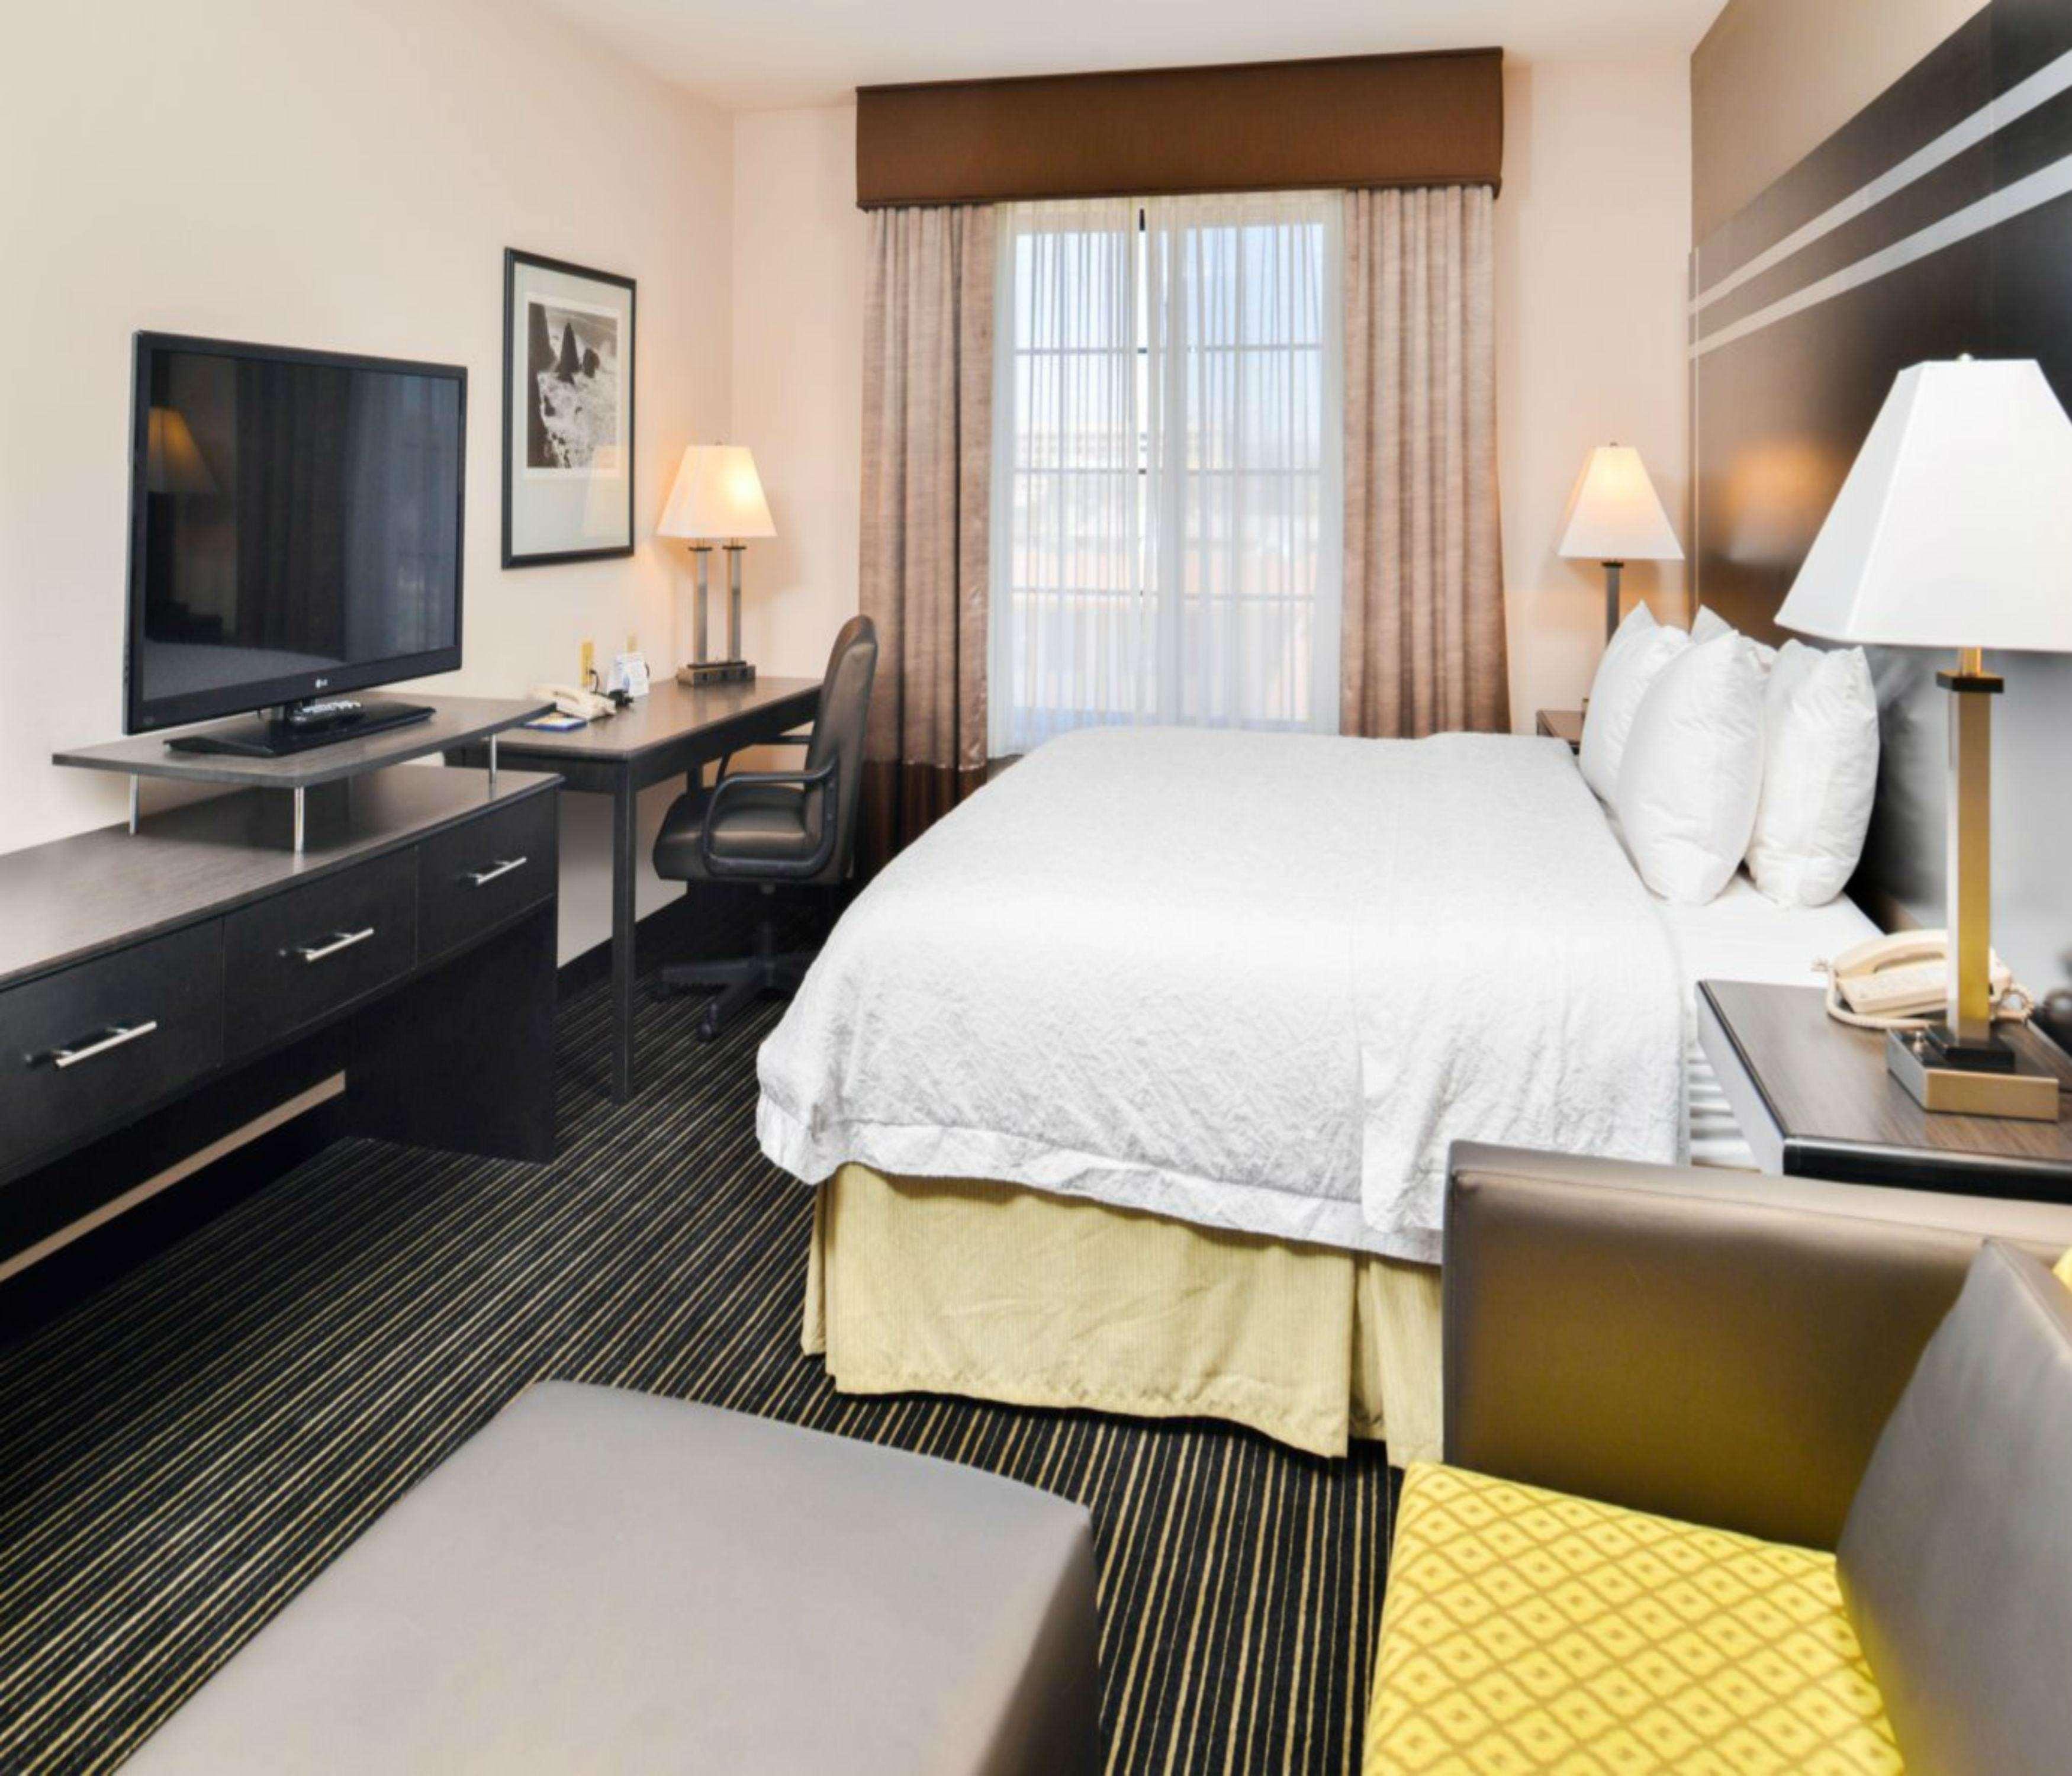 Hampton Inn & Suites San Francisco-Burlingame-Airport South image 26